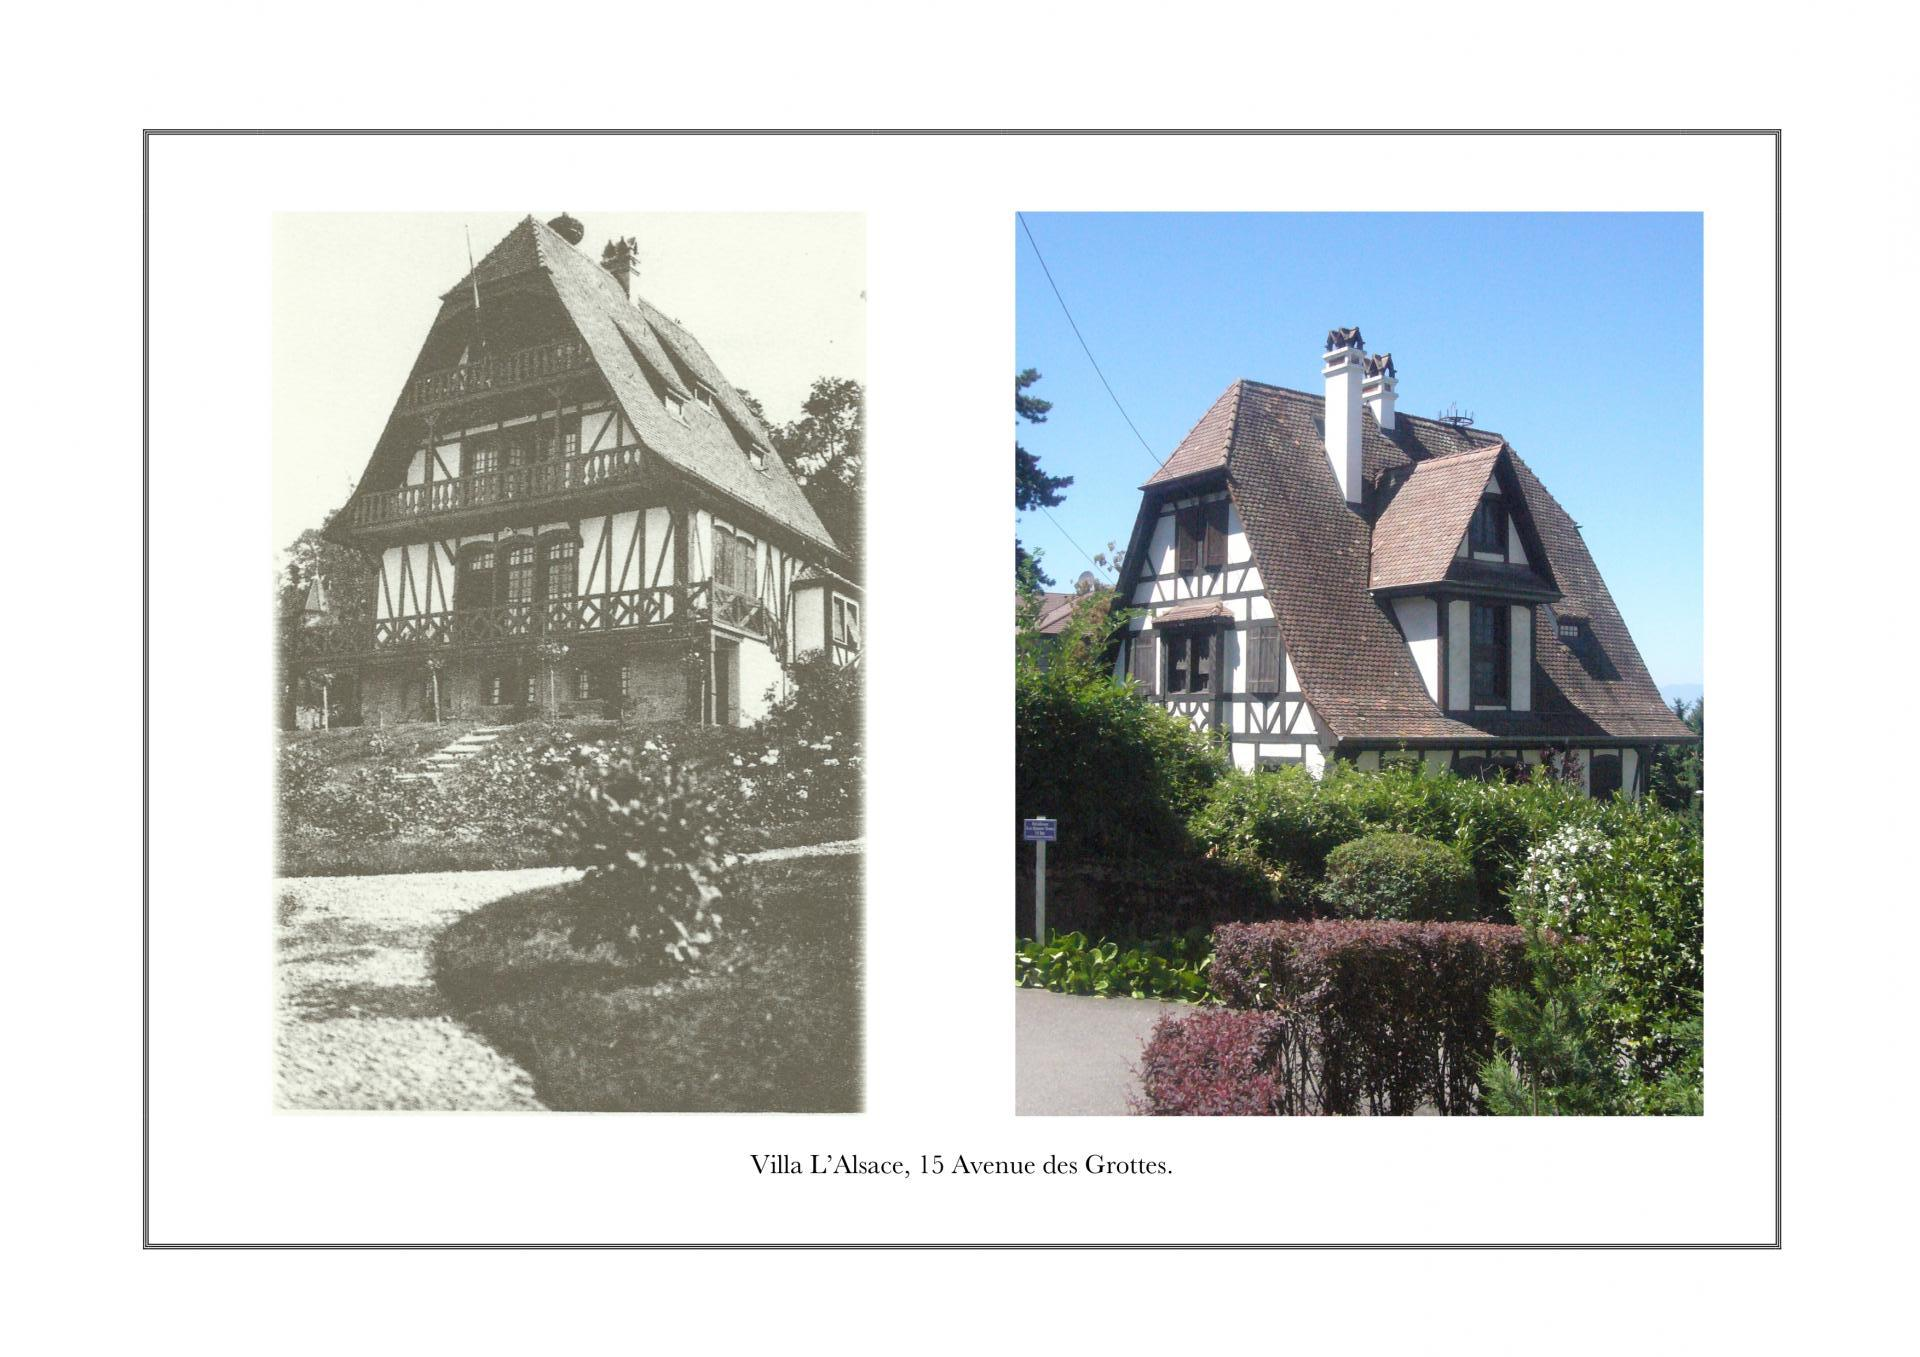 Villa L'Alsace, 15 avenue des Grottes